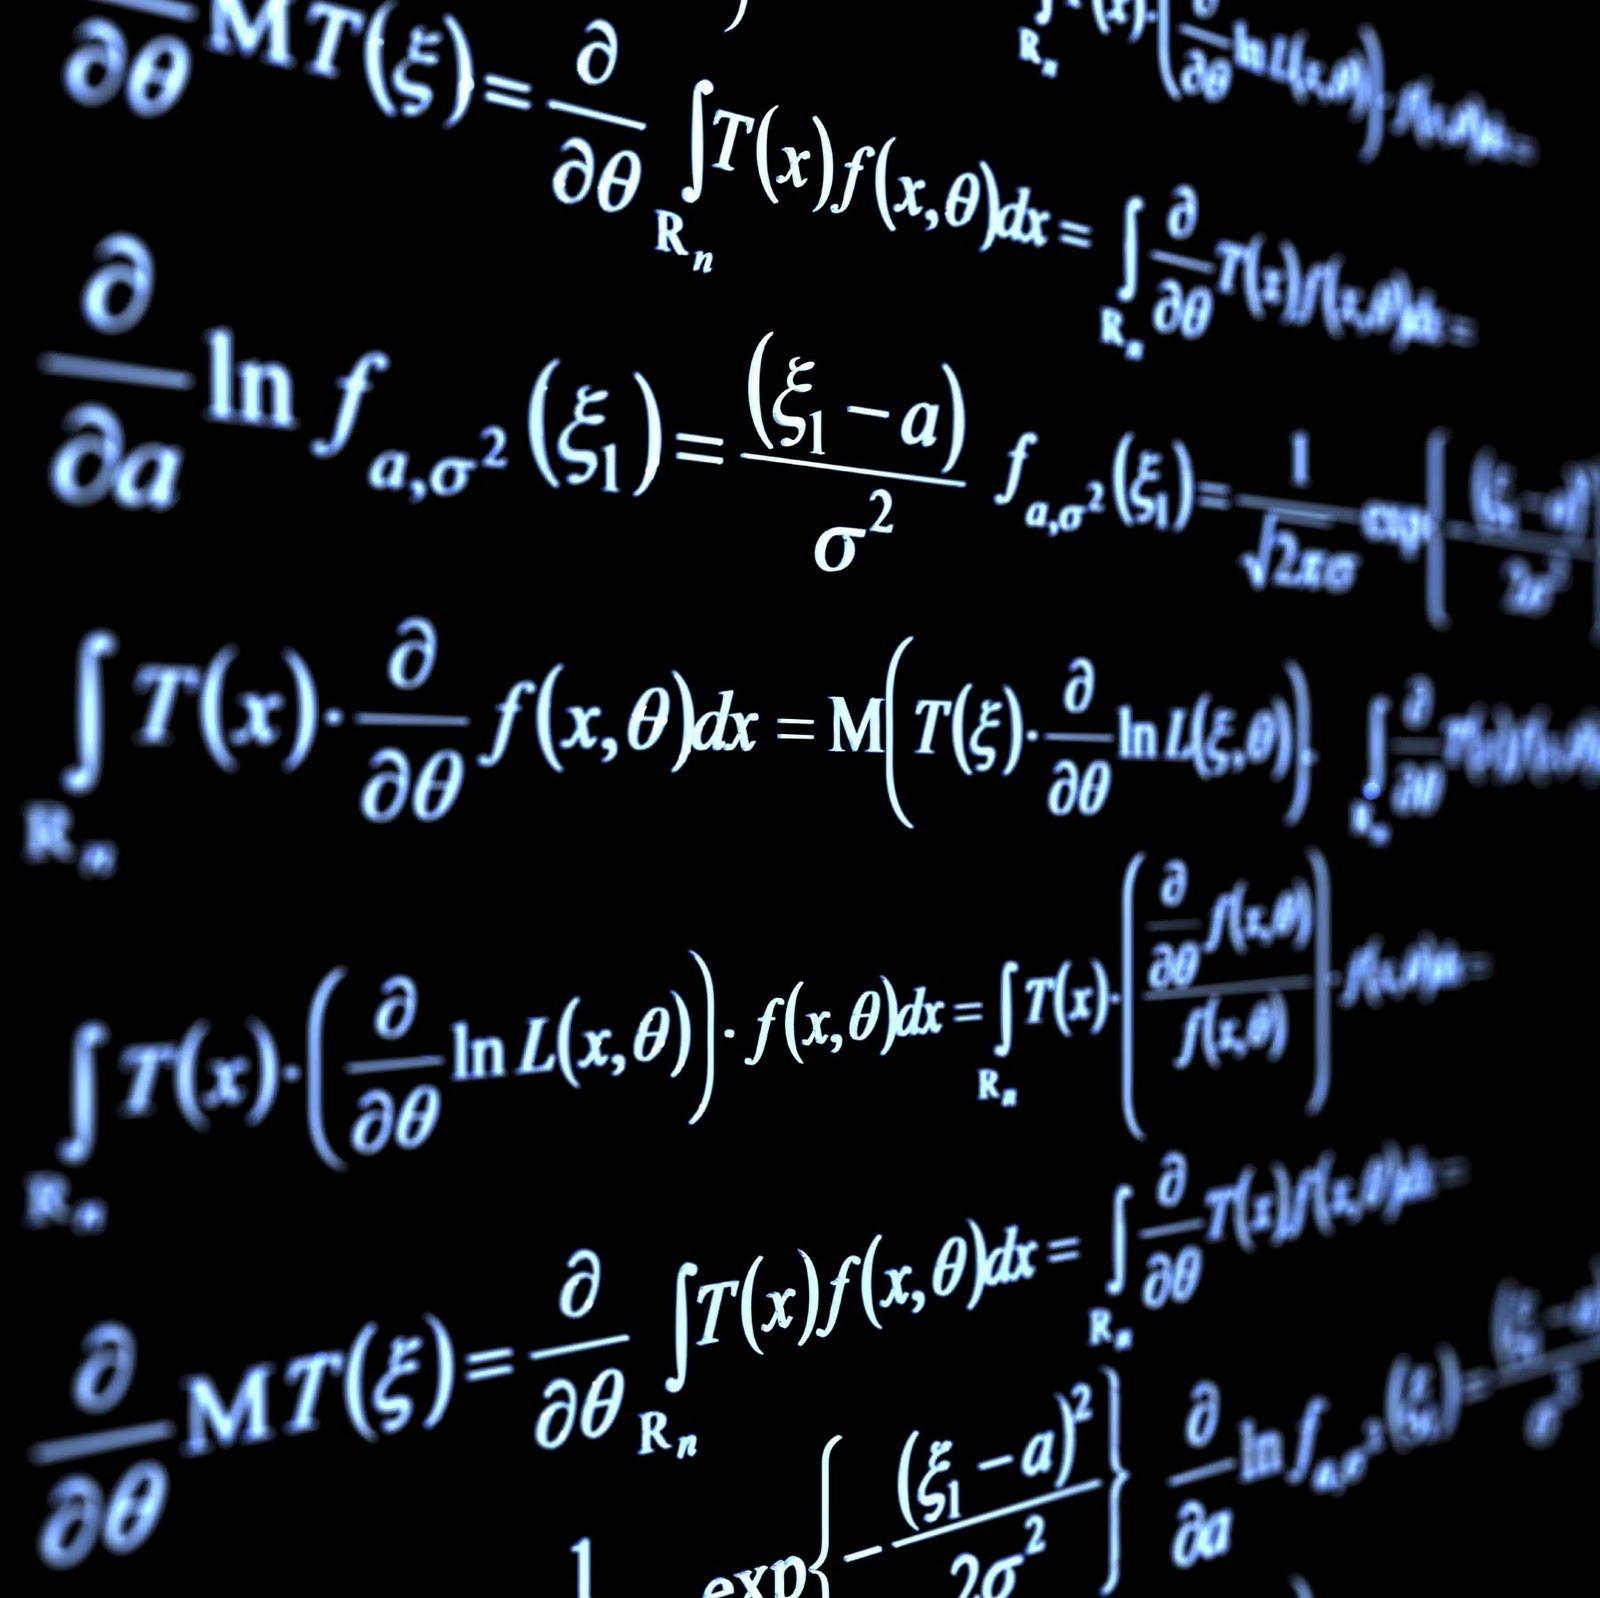 Matematik duvar kağıtları hd mathematics wallpapers pi